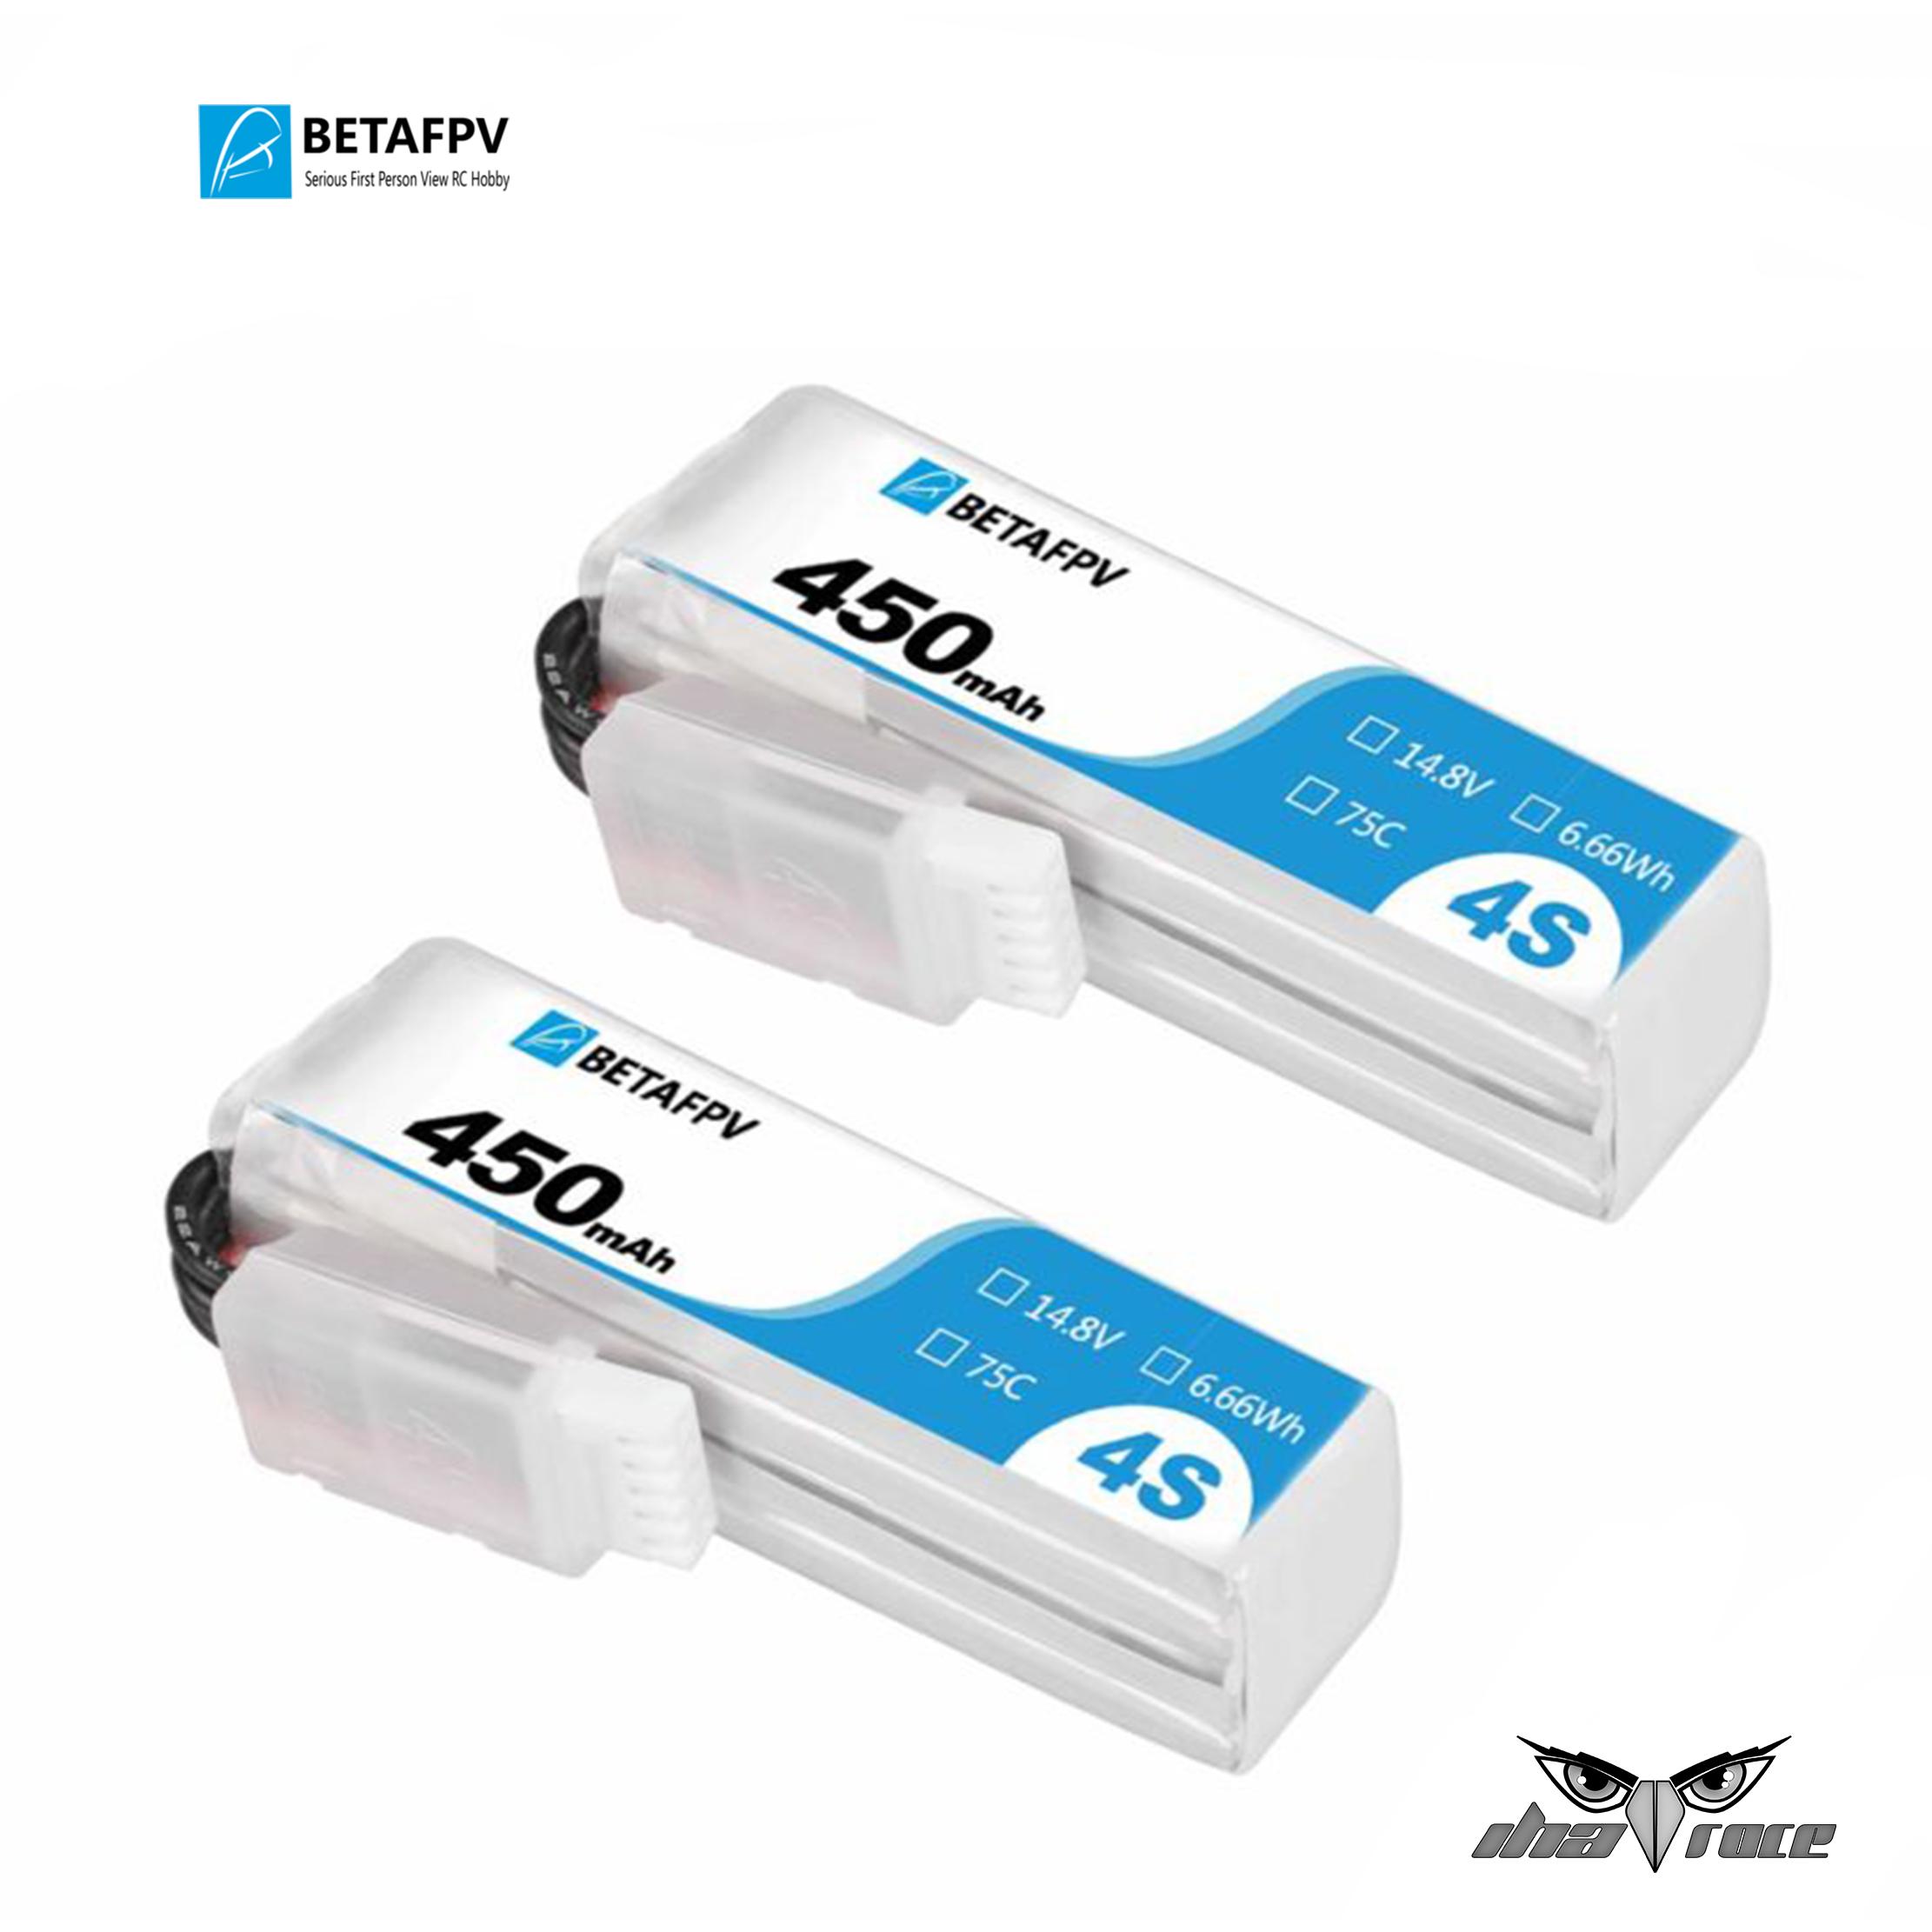 Batería BetaFPV 4S 75C 450mAh XT30 (2 Piezas)